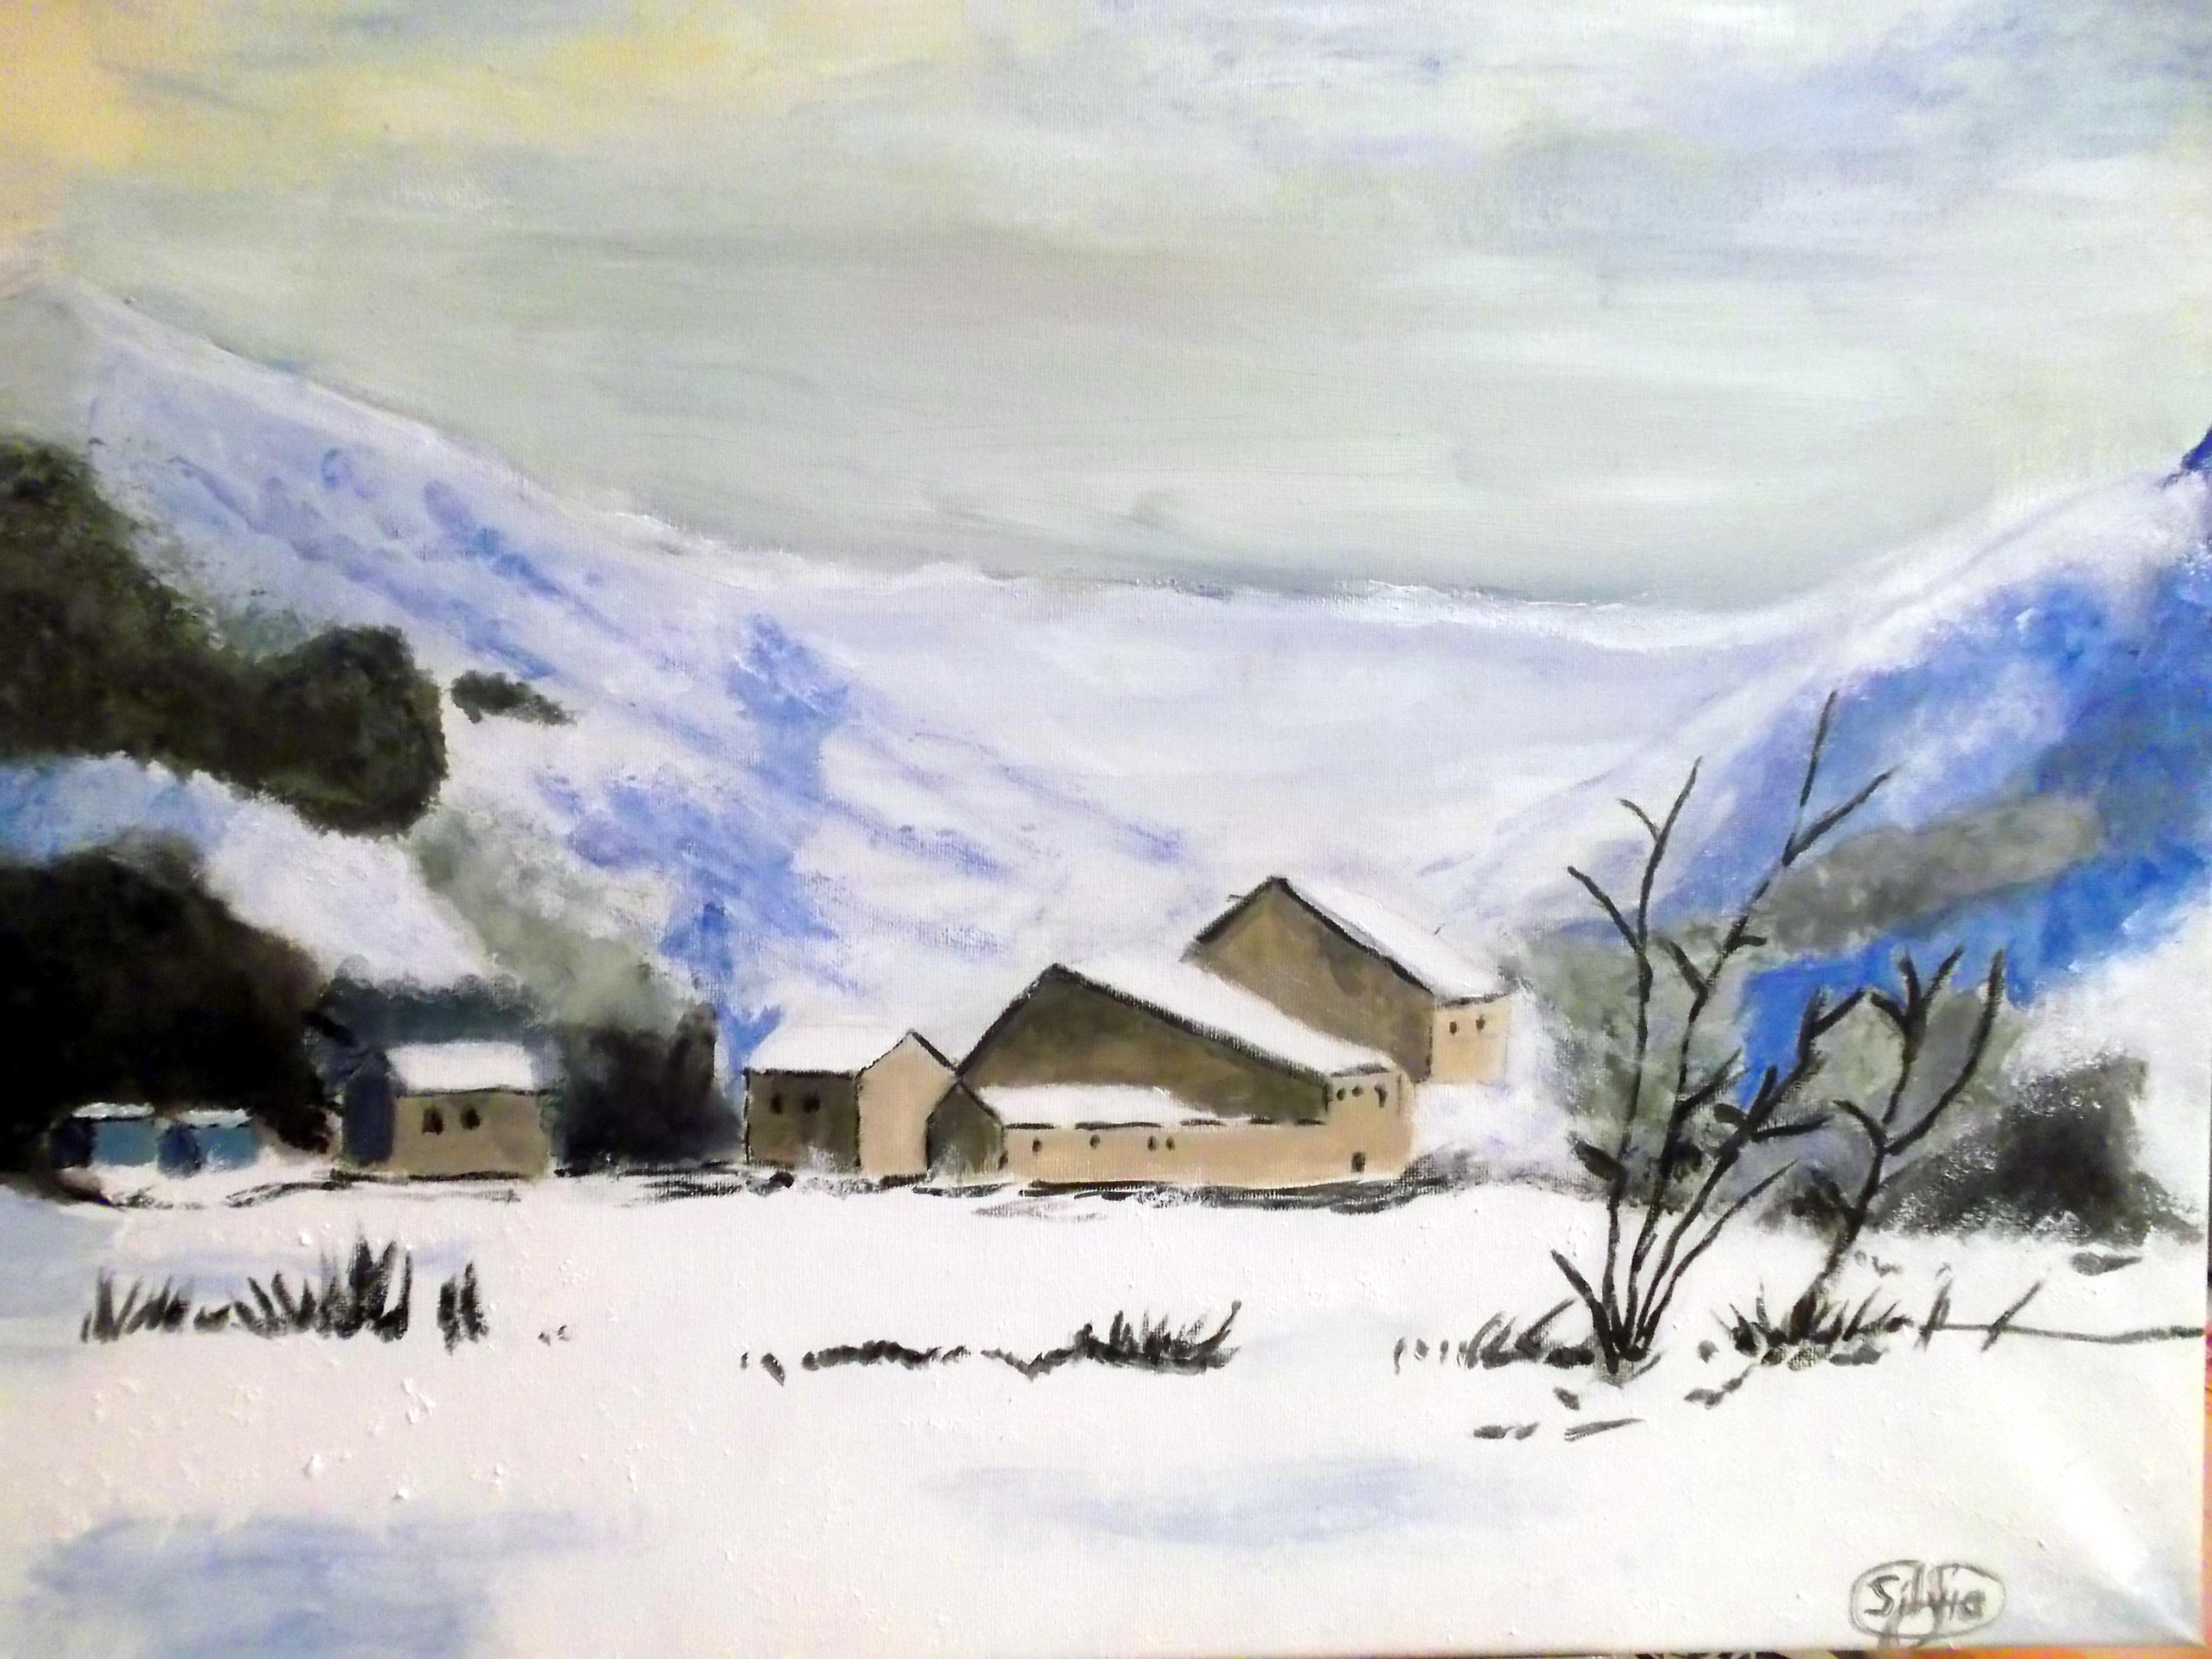 Paisajes nevados de mis peque as artistas mi taller de - Paisajes nevados para pintar ...